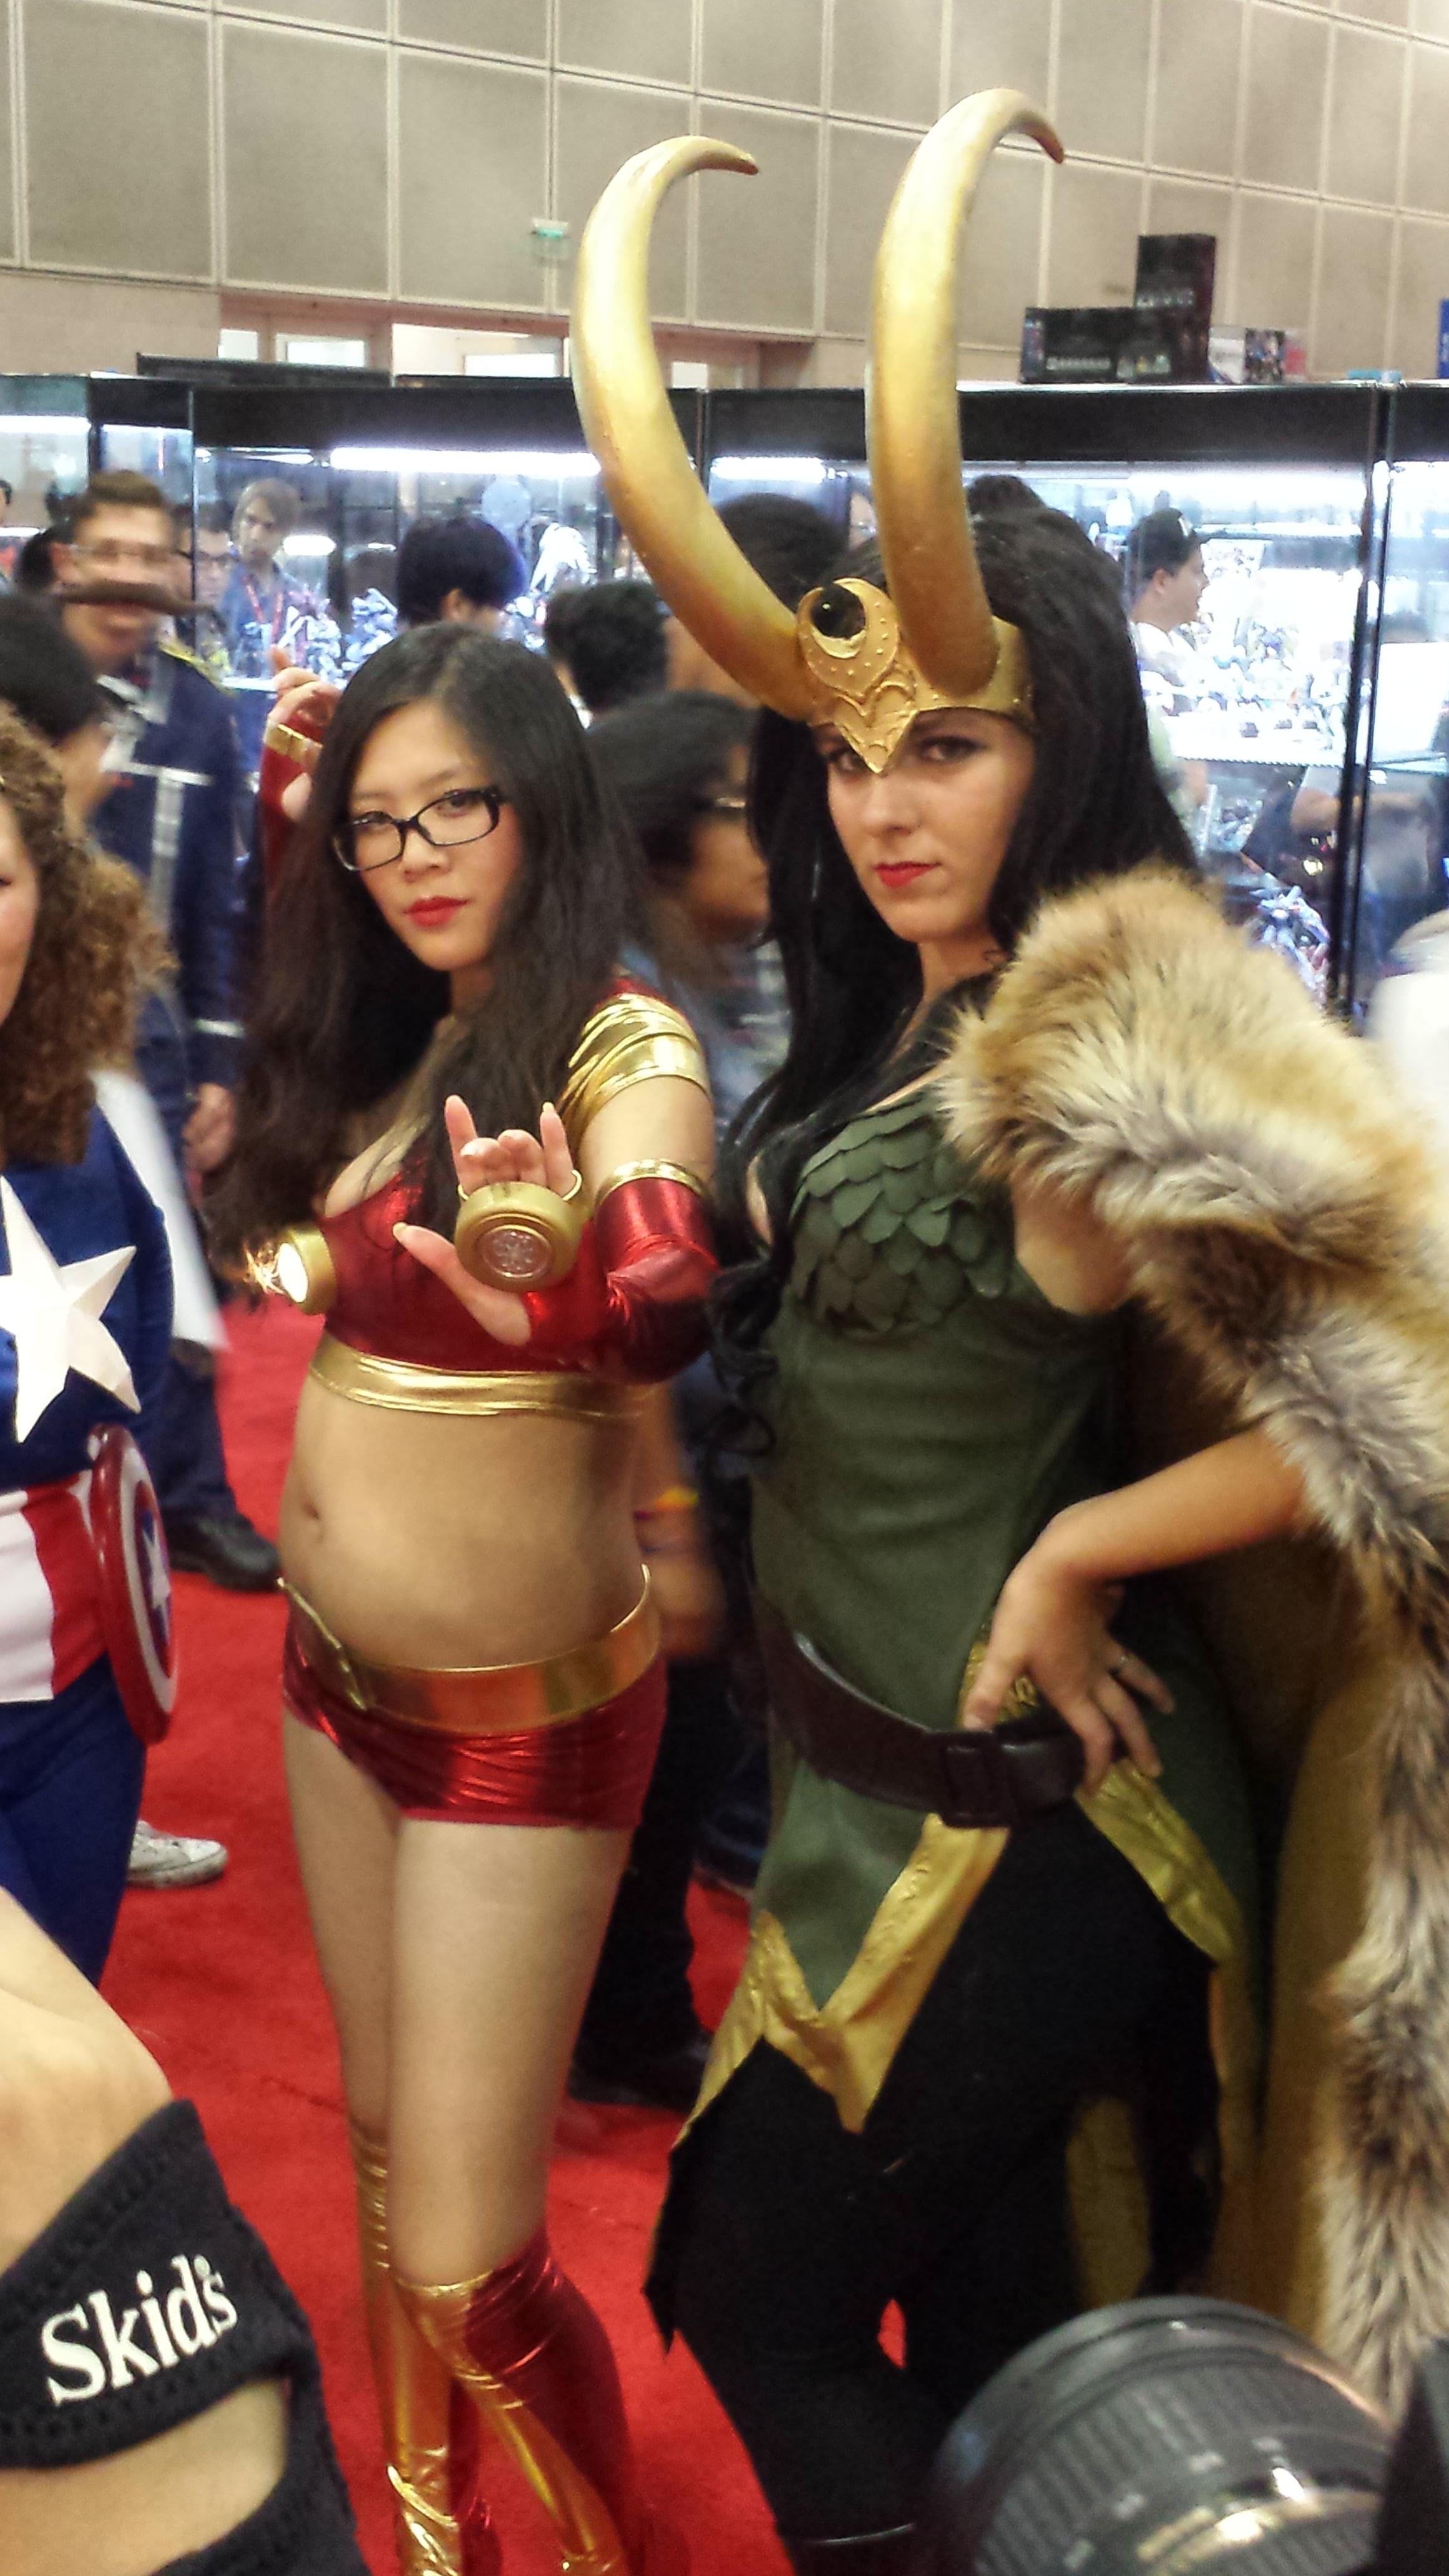 AnimeExpo 2013 - Avengers Assemble